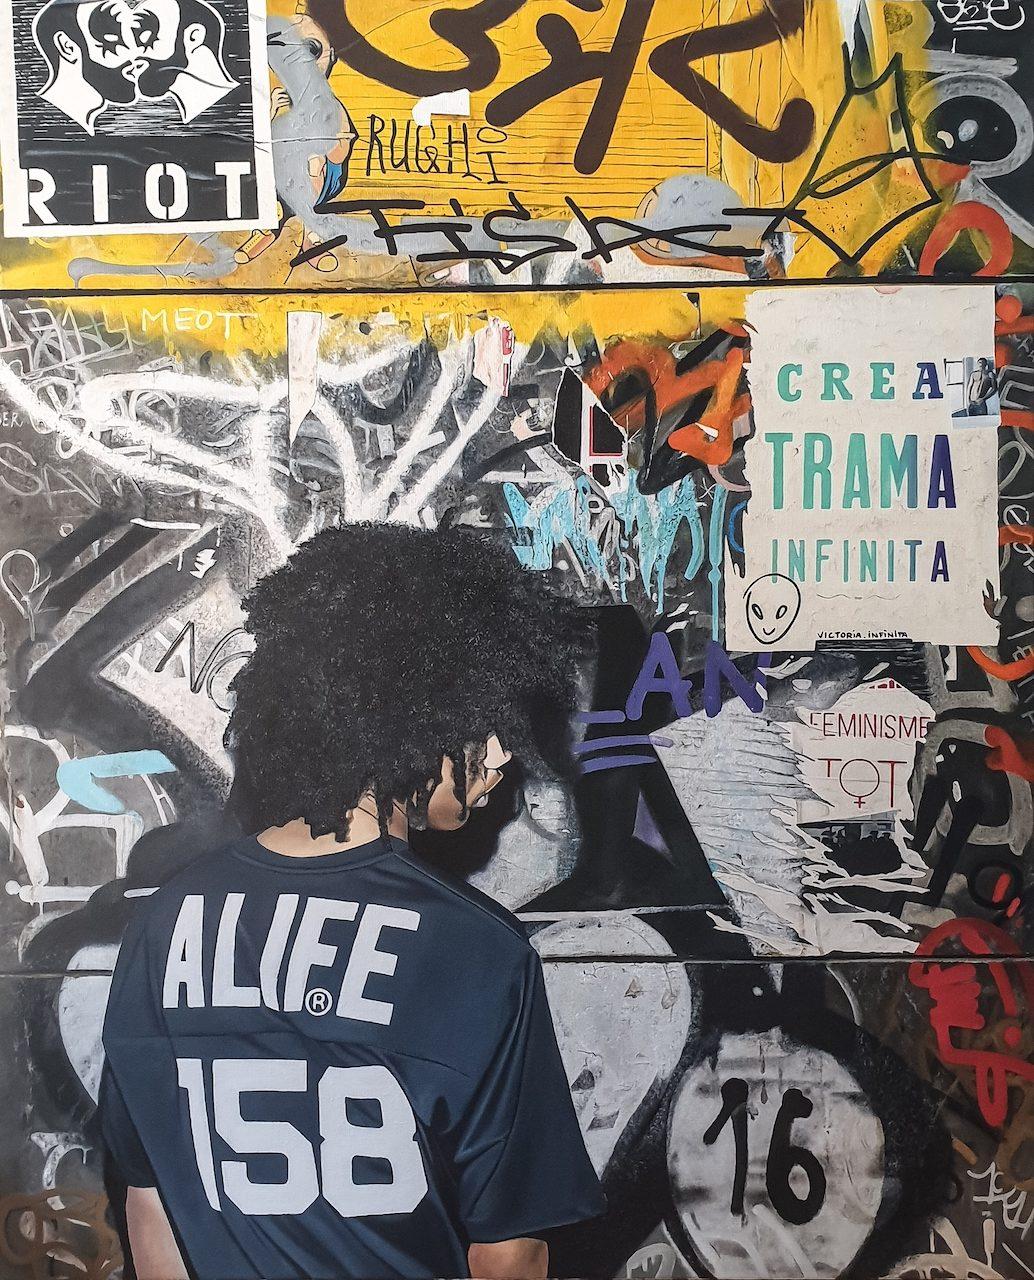 Nicolas Clezio Hyper réalisme Street art graffiti